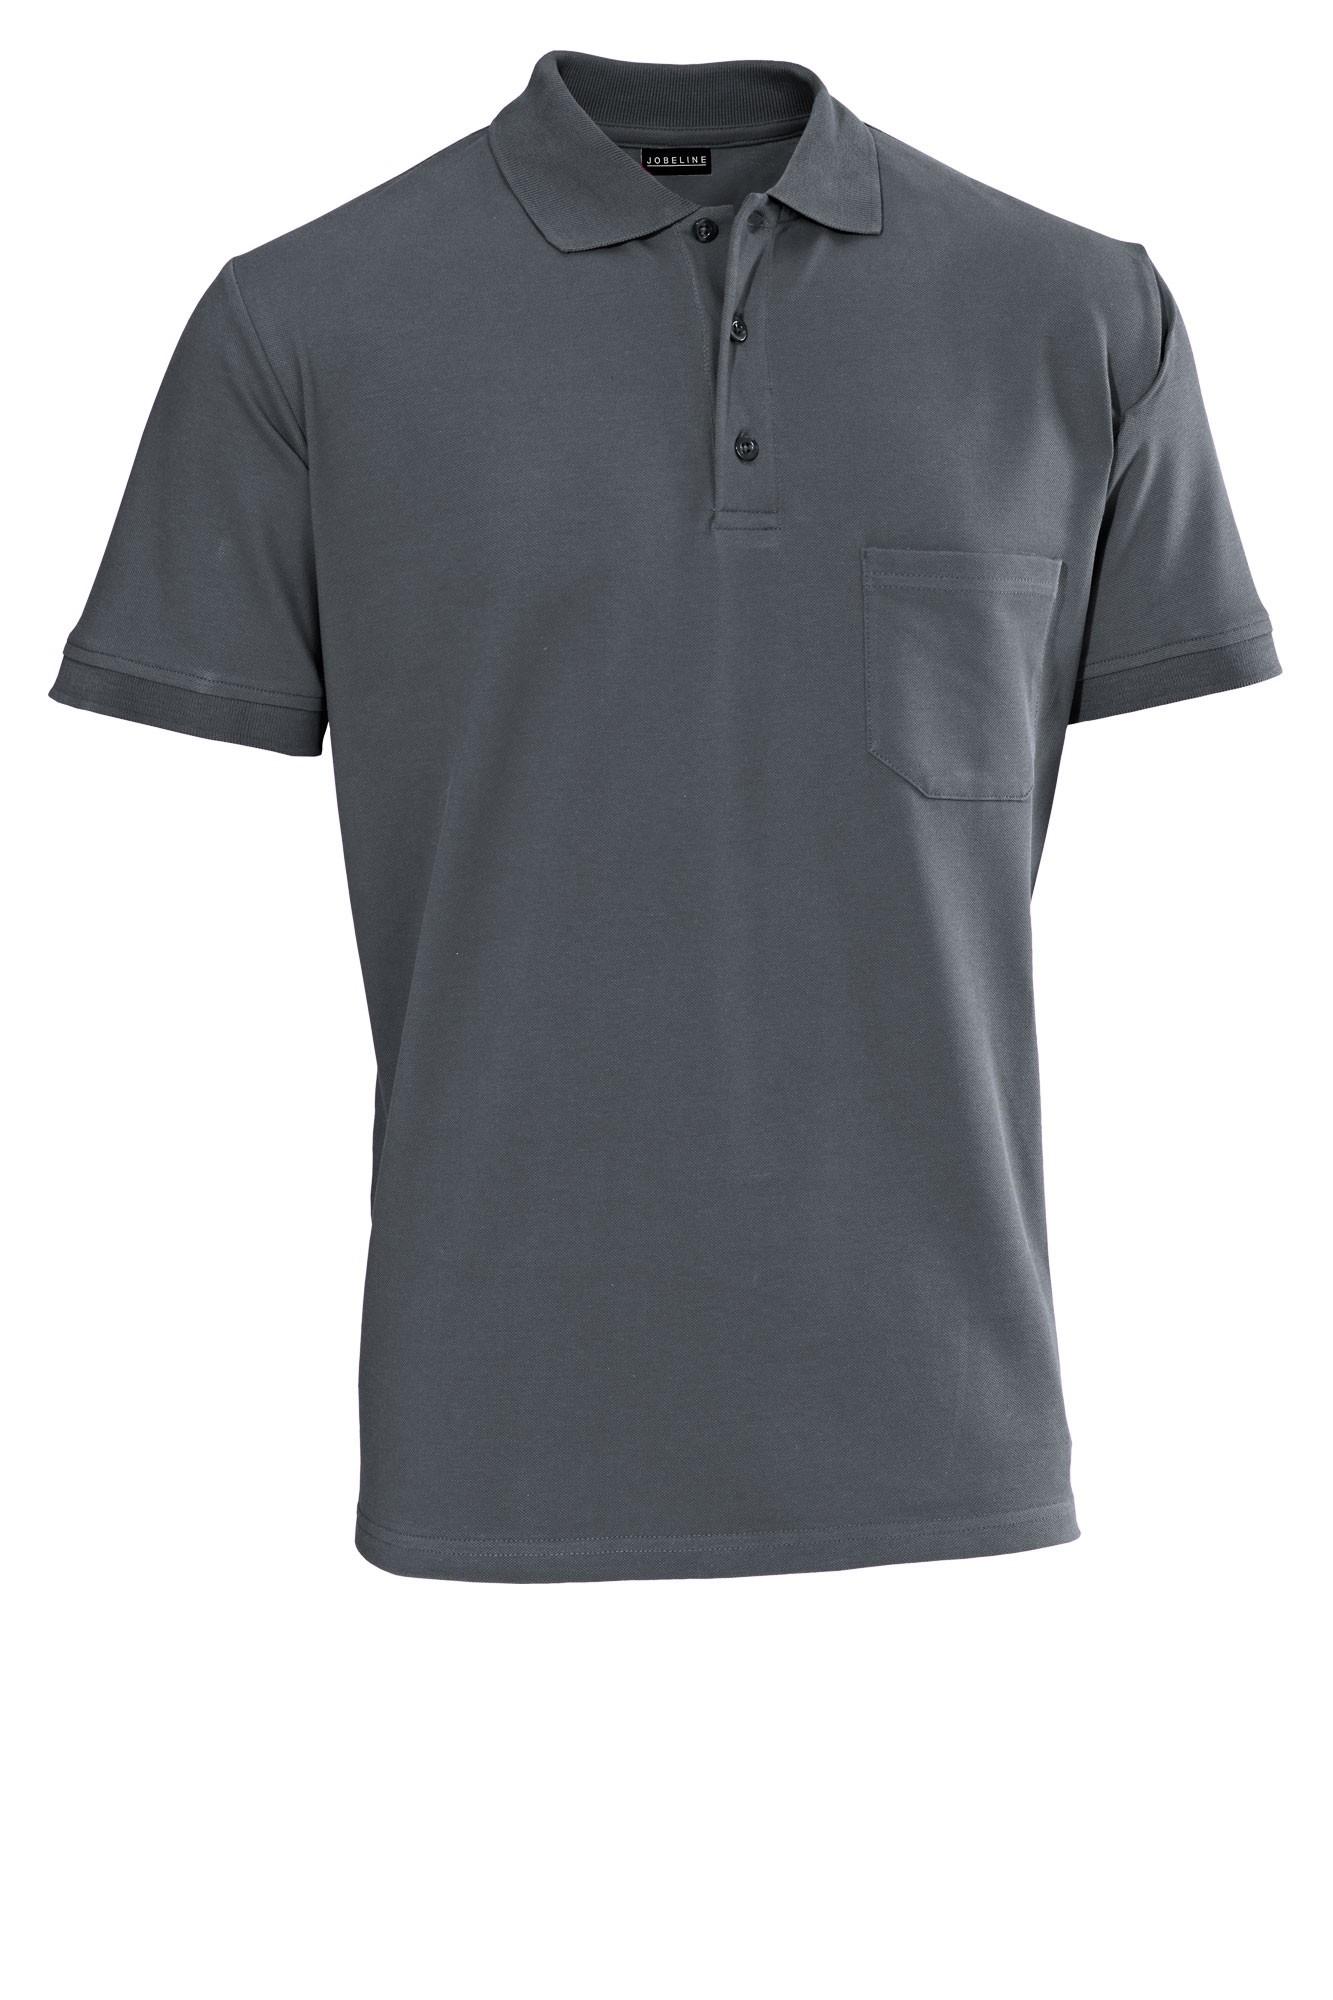 Pánské tričko Cato - šedá/krátký rukáv